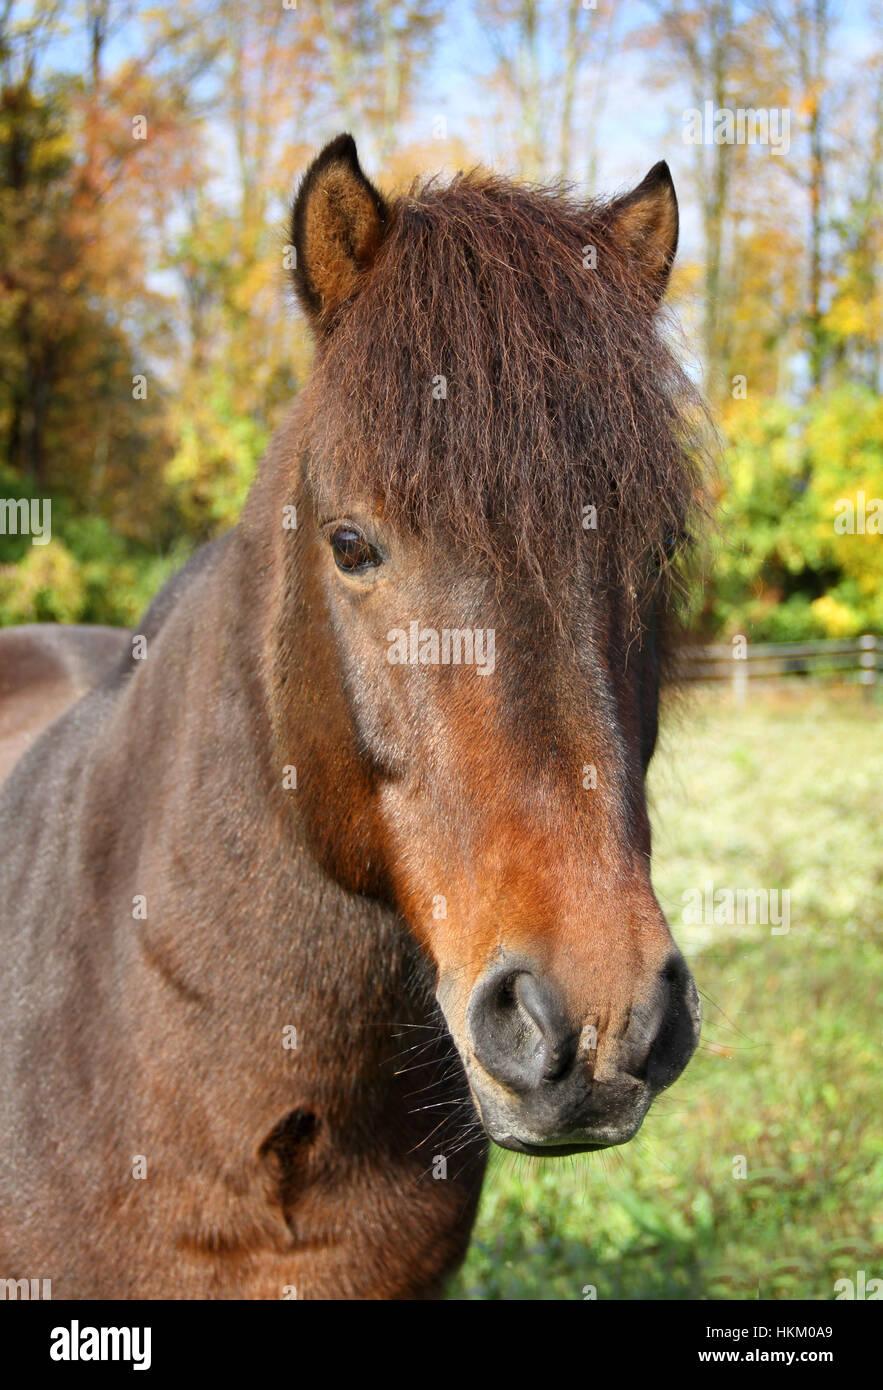 A proud Icelandic horse stallion in the autumn pasture - Stock Image